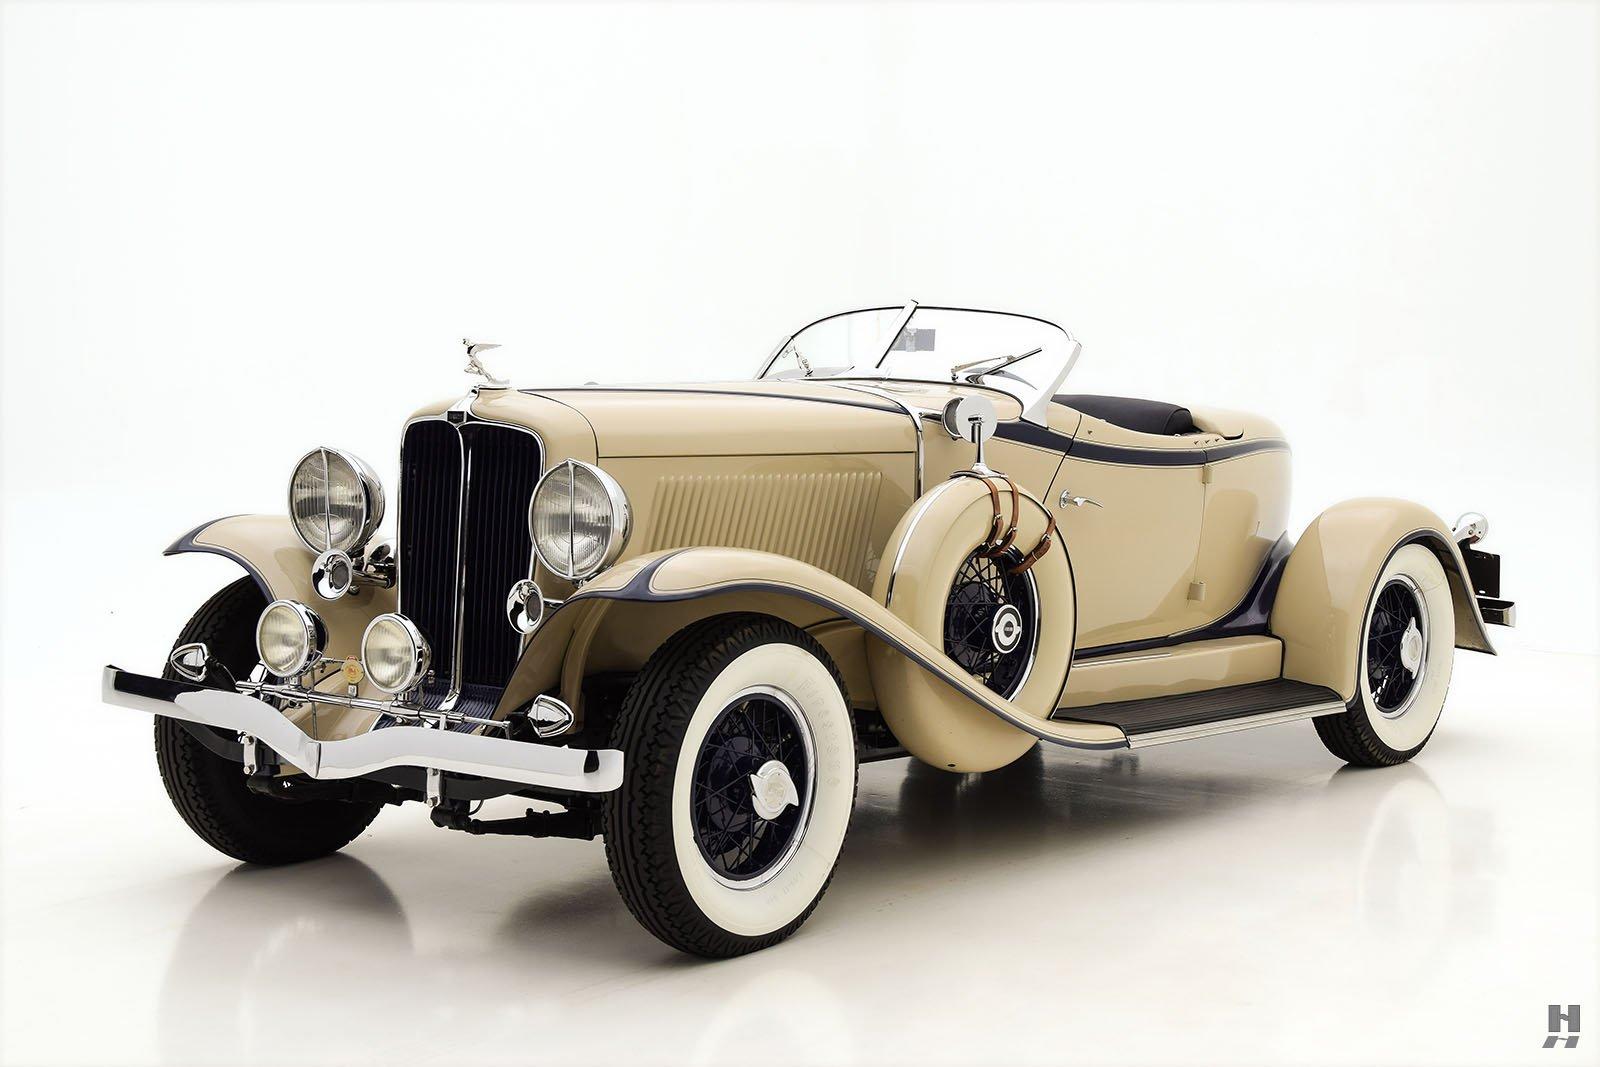 1931 Auburn 8-98 Speedster For Sale | Buy Classic Cars | Hyman LTD